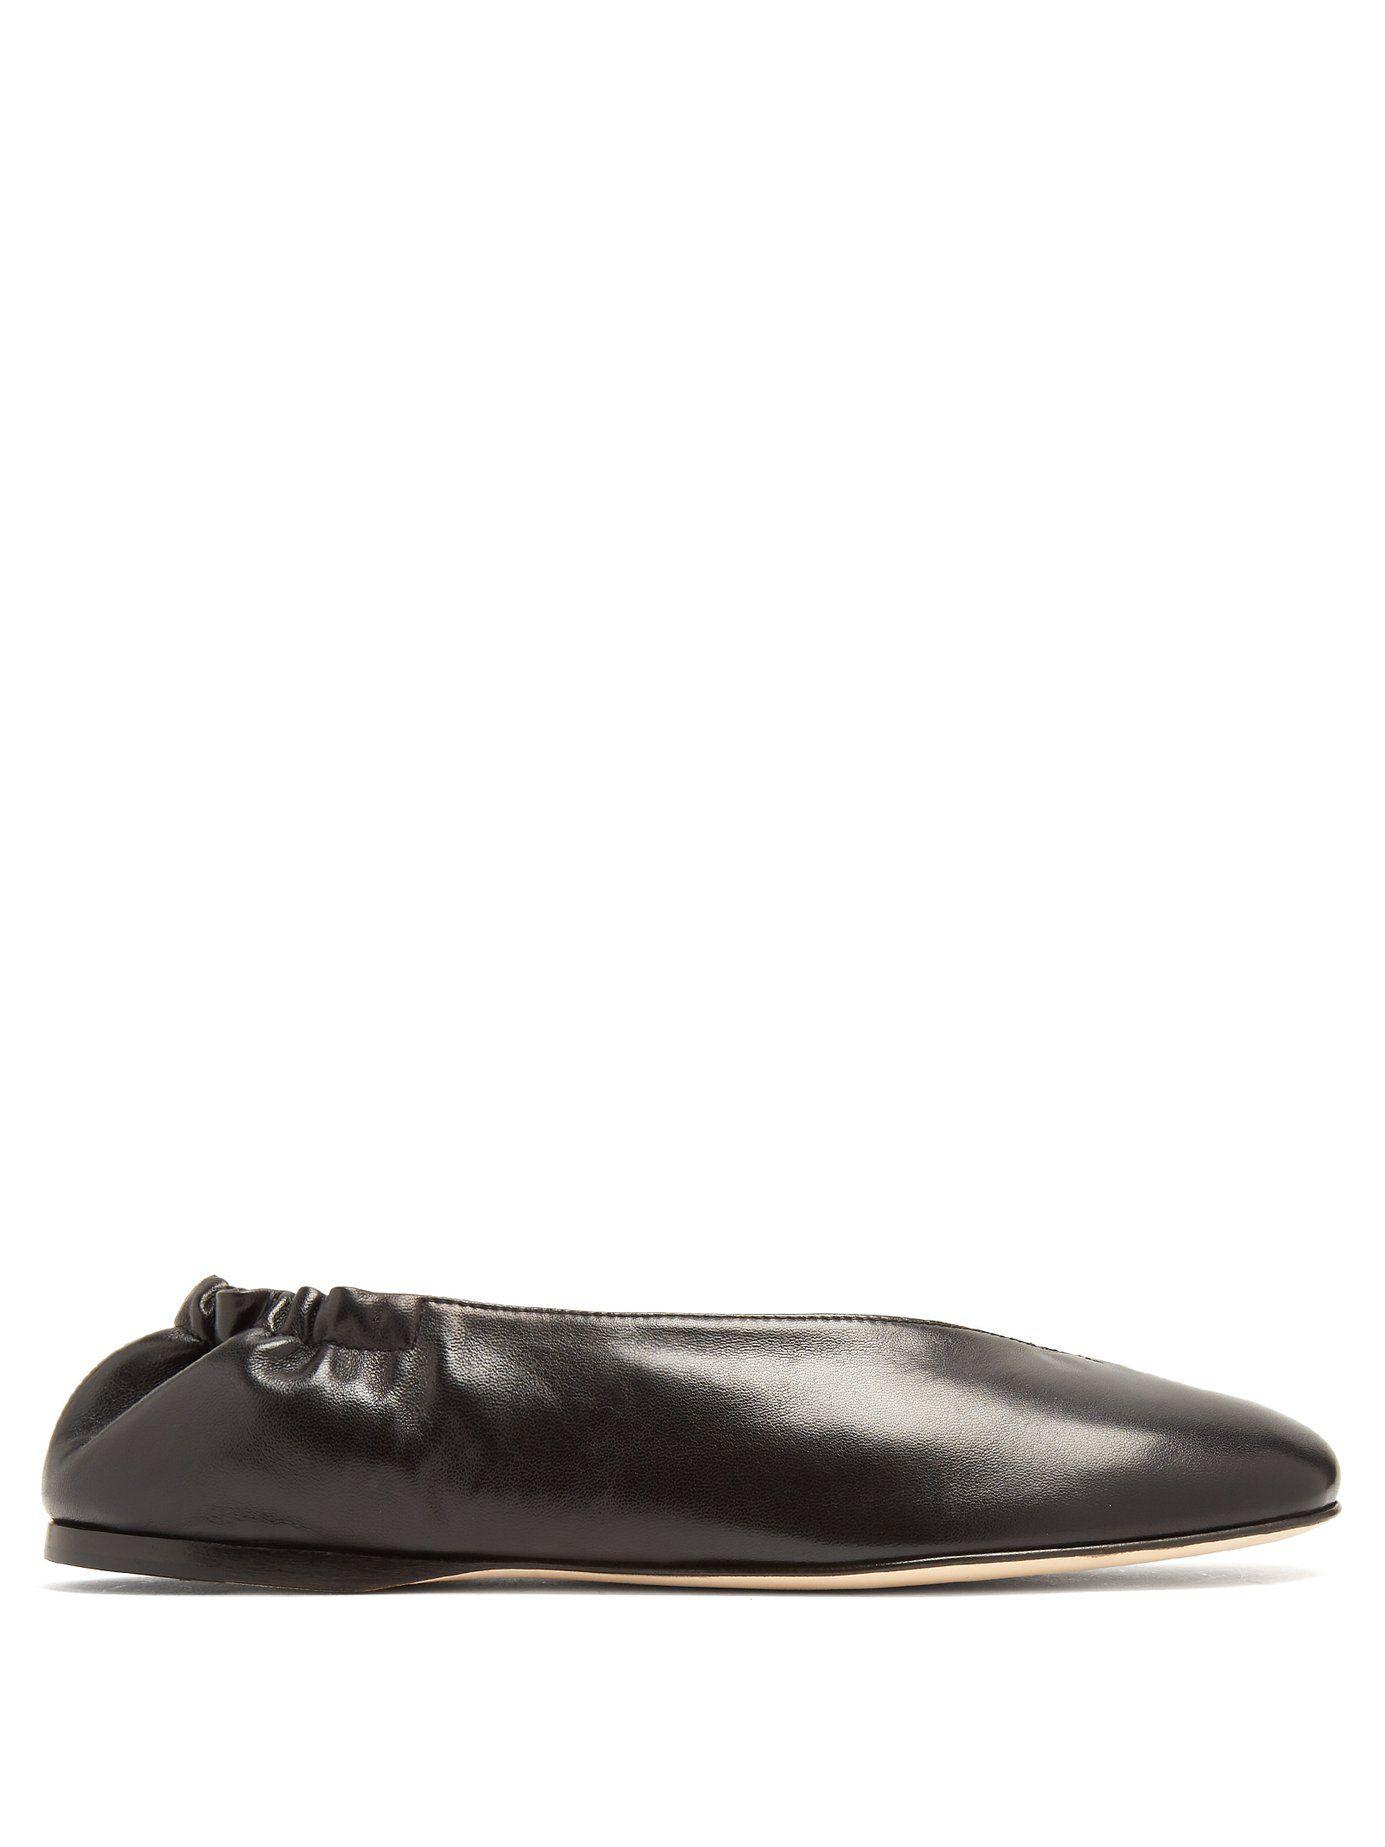 b016ef336075 Oddry elasticated-heel leather ballet flats